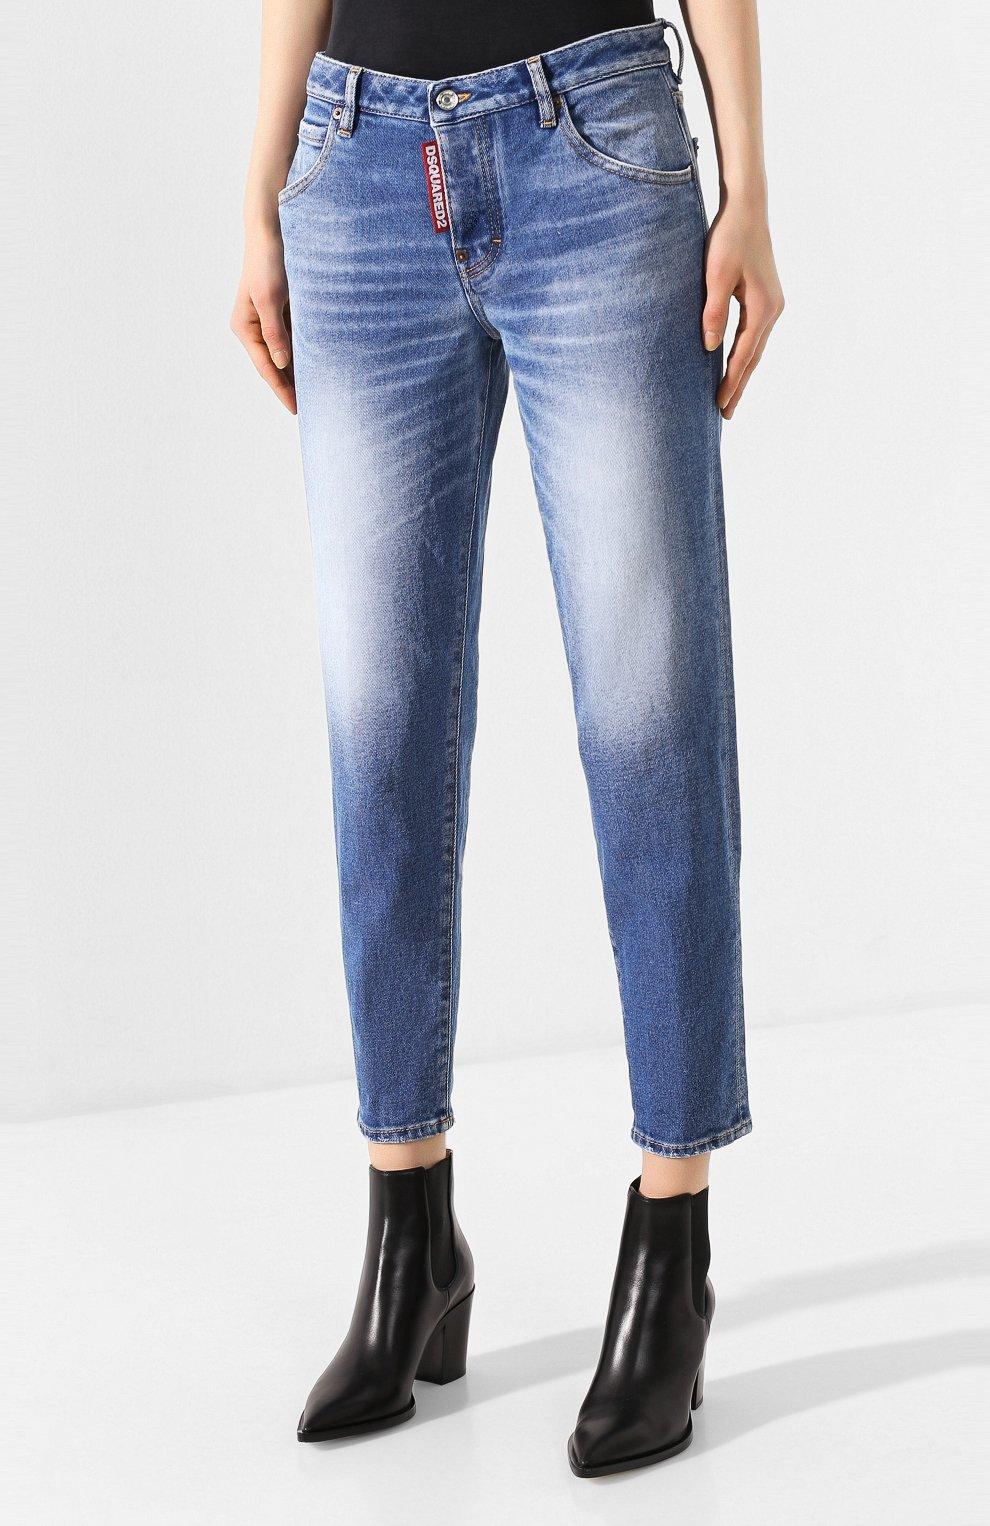 Женские джинсы DSQUARED2 синего цвета, арт. S75LB0278/S30662 | Фото 3